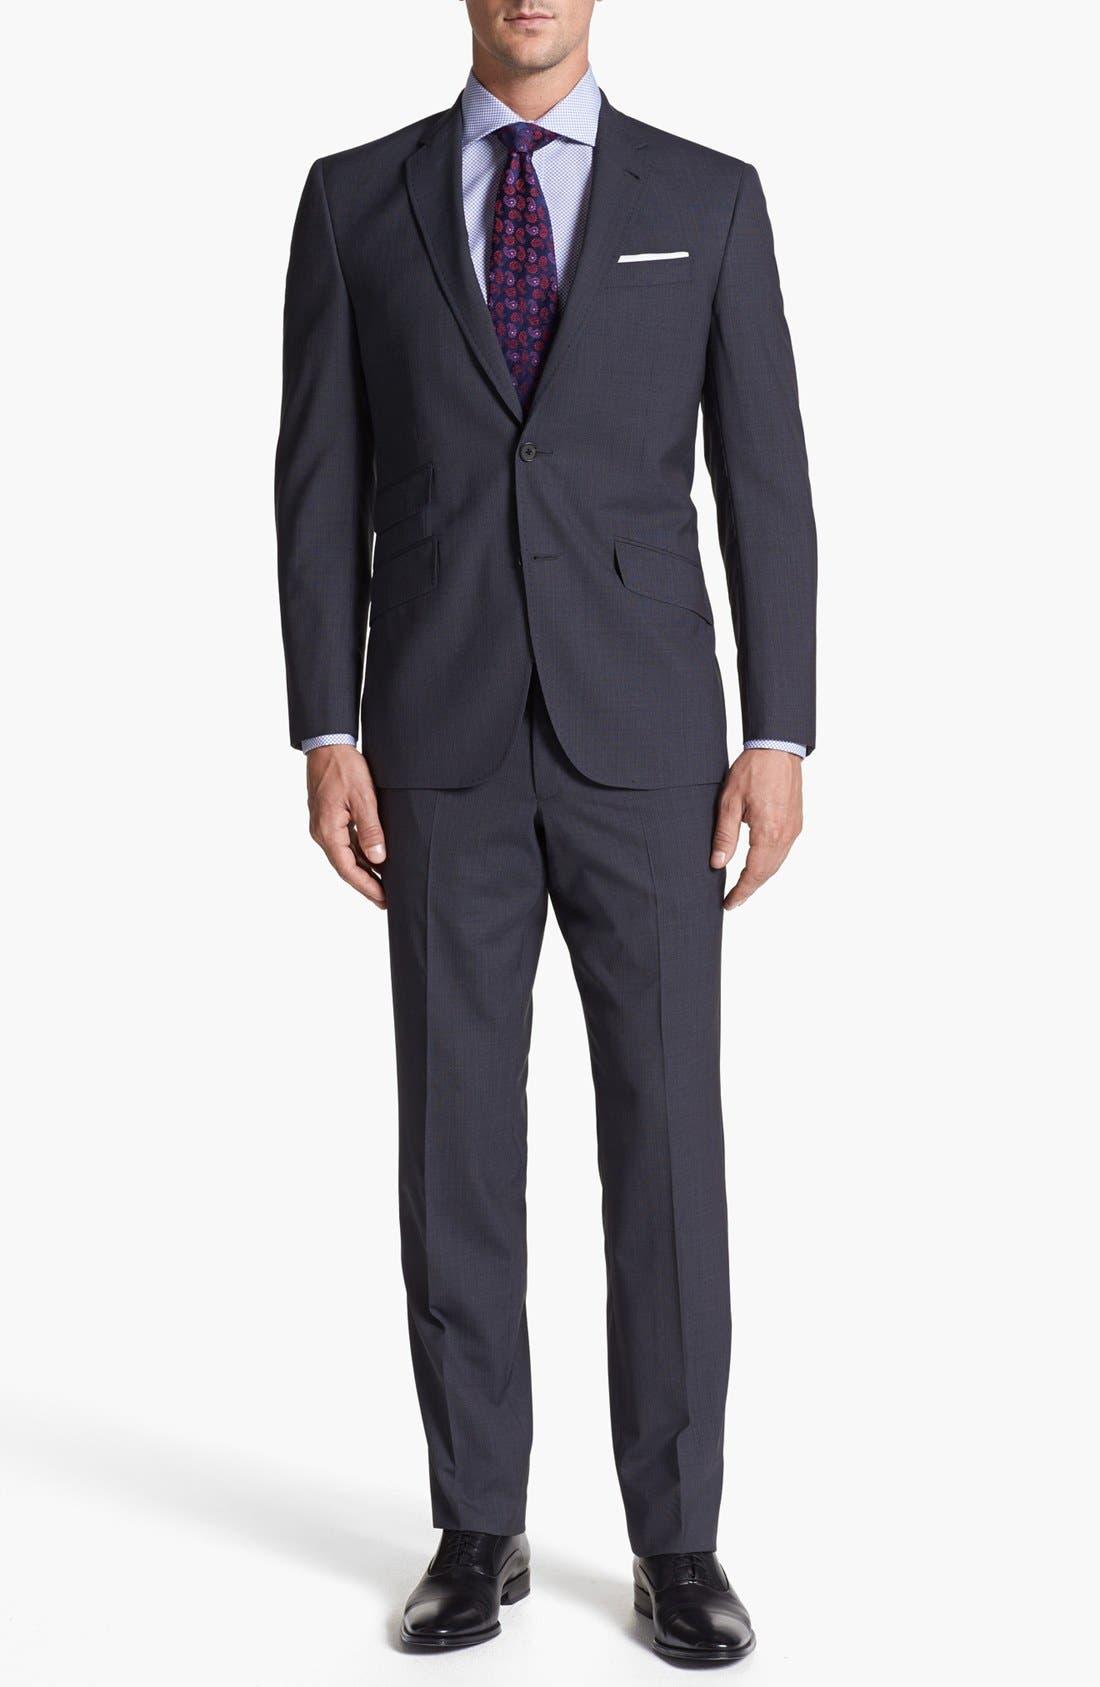 Main Image - Ted Baker London 'Jim' Pinstripe Wool Suit